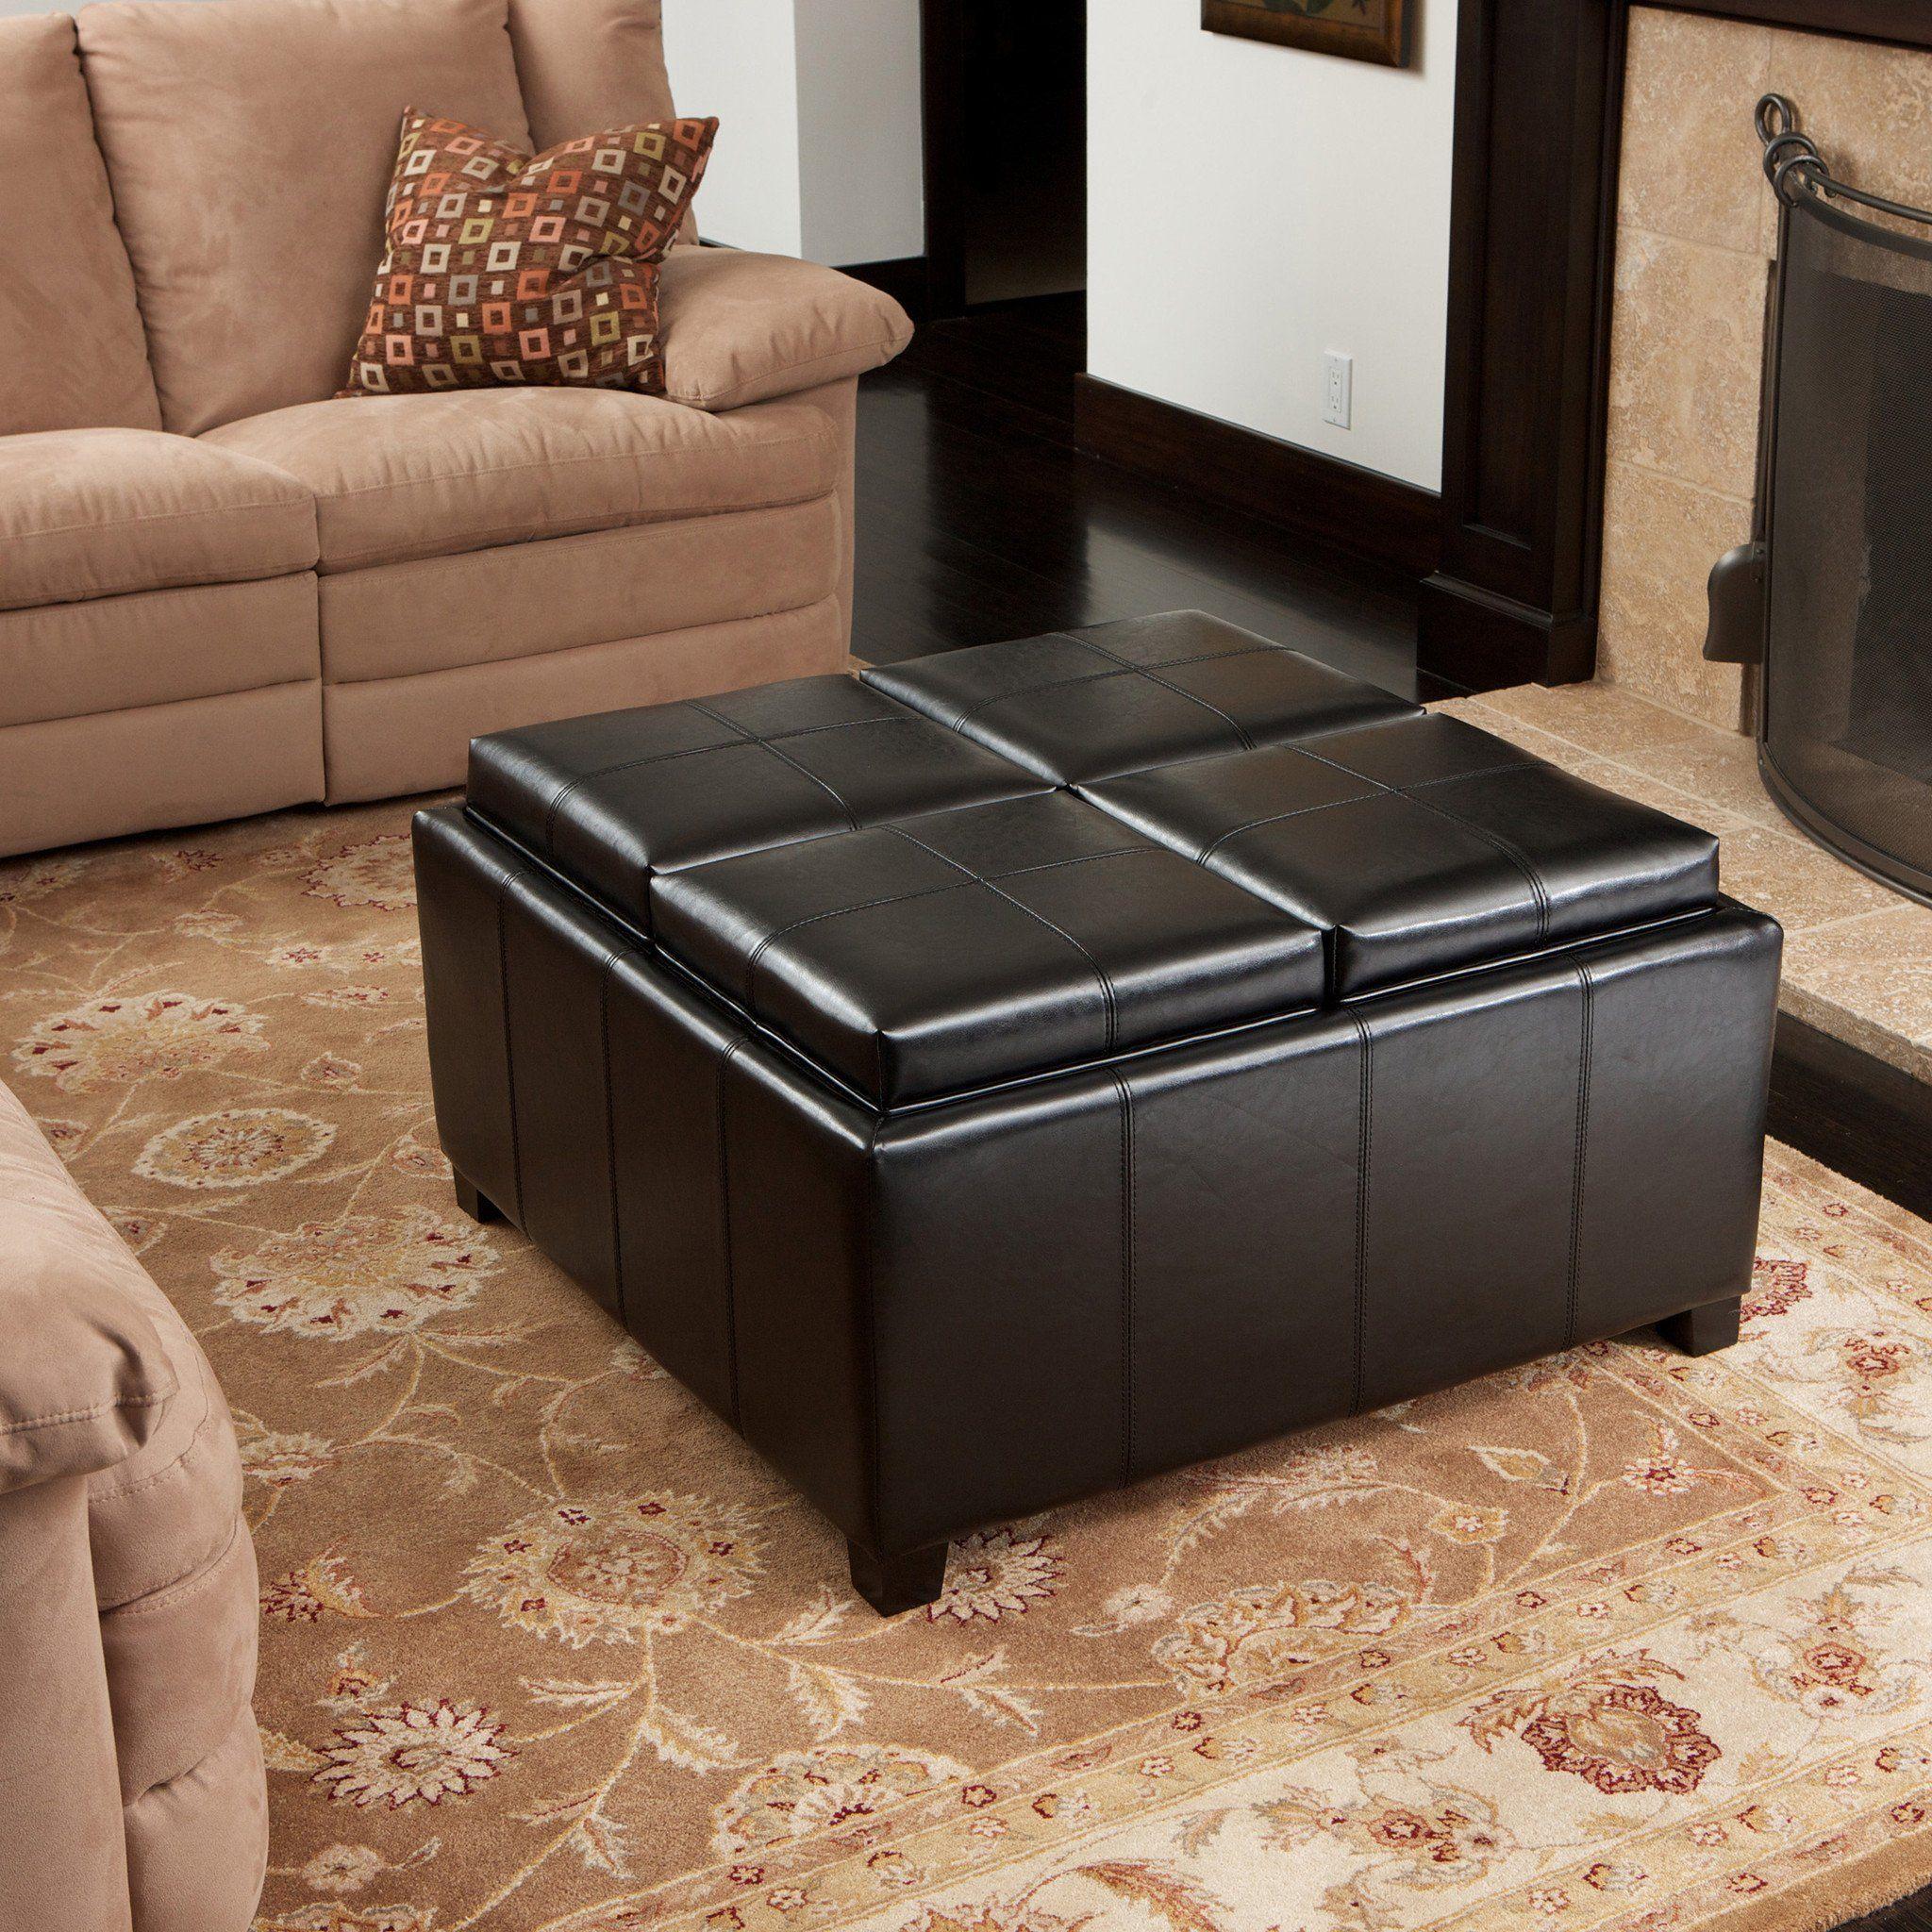 Harley Leather Black 4 Tray Top Storage Ottoman